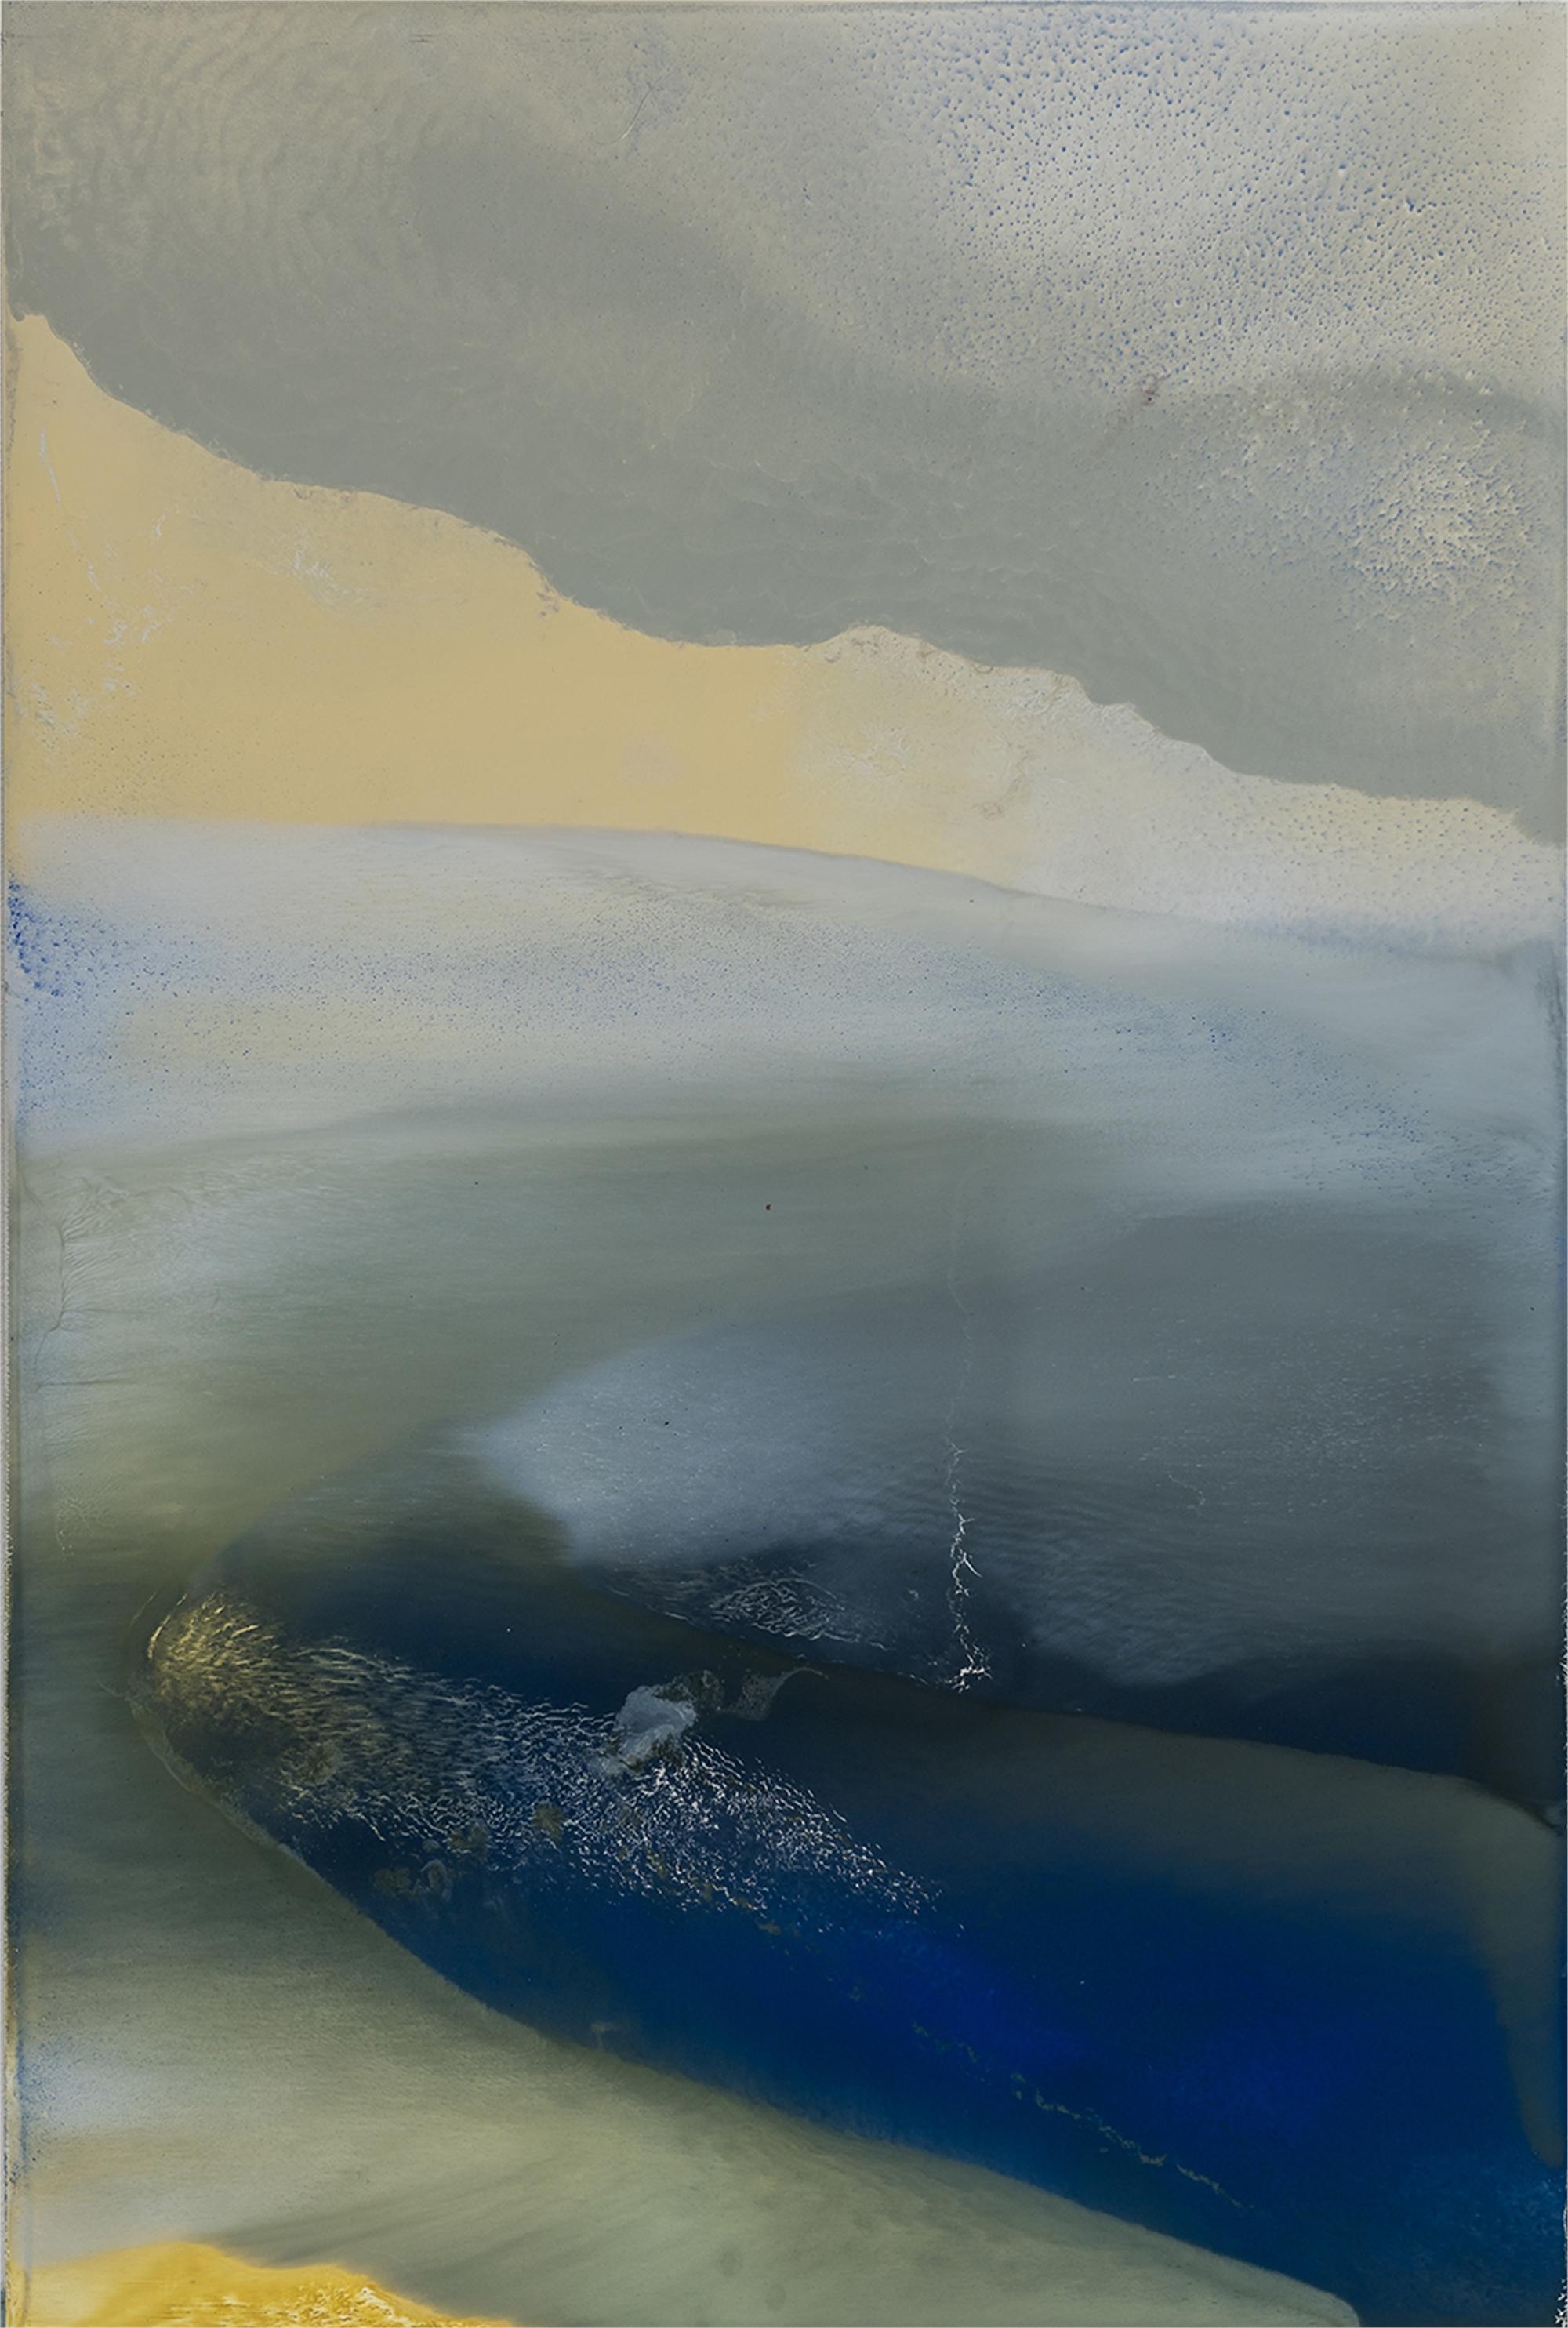 Rumination by Alla Goniodsky